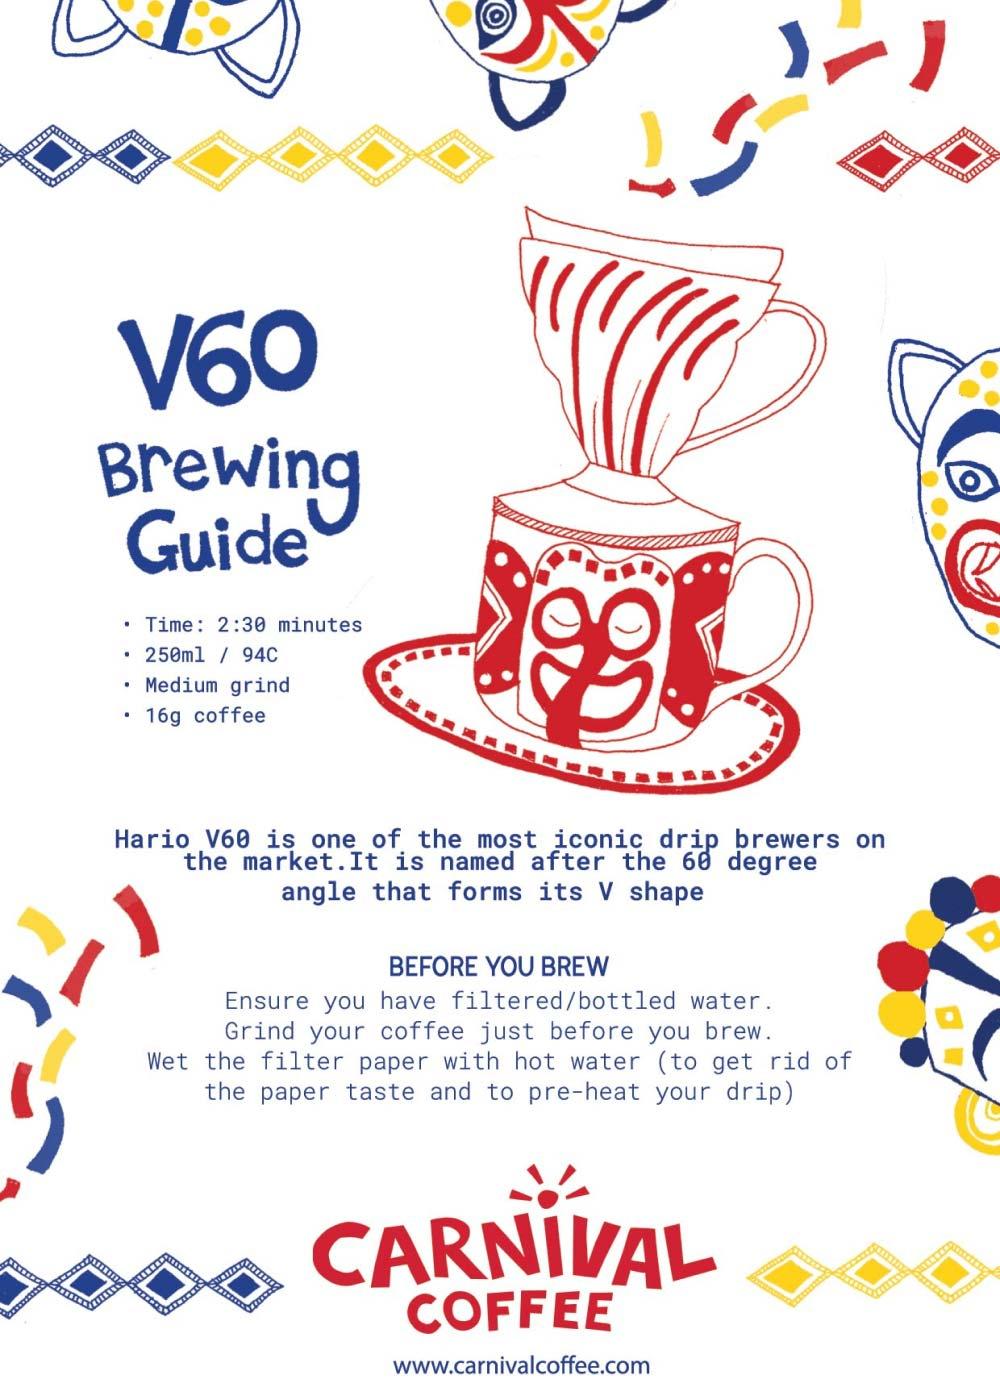 V60 Brewing Guide